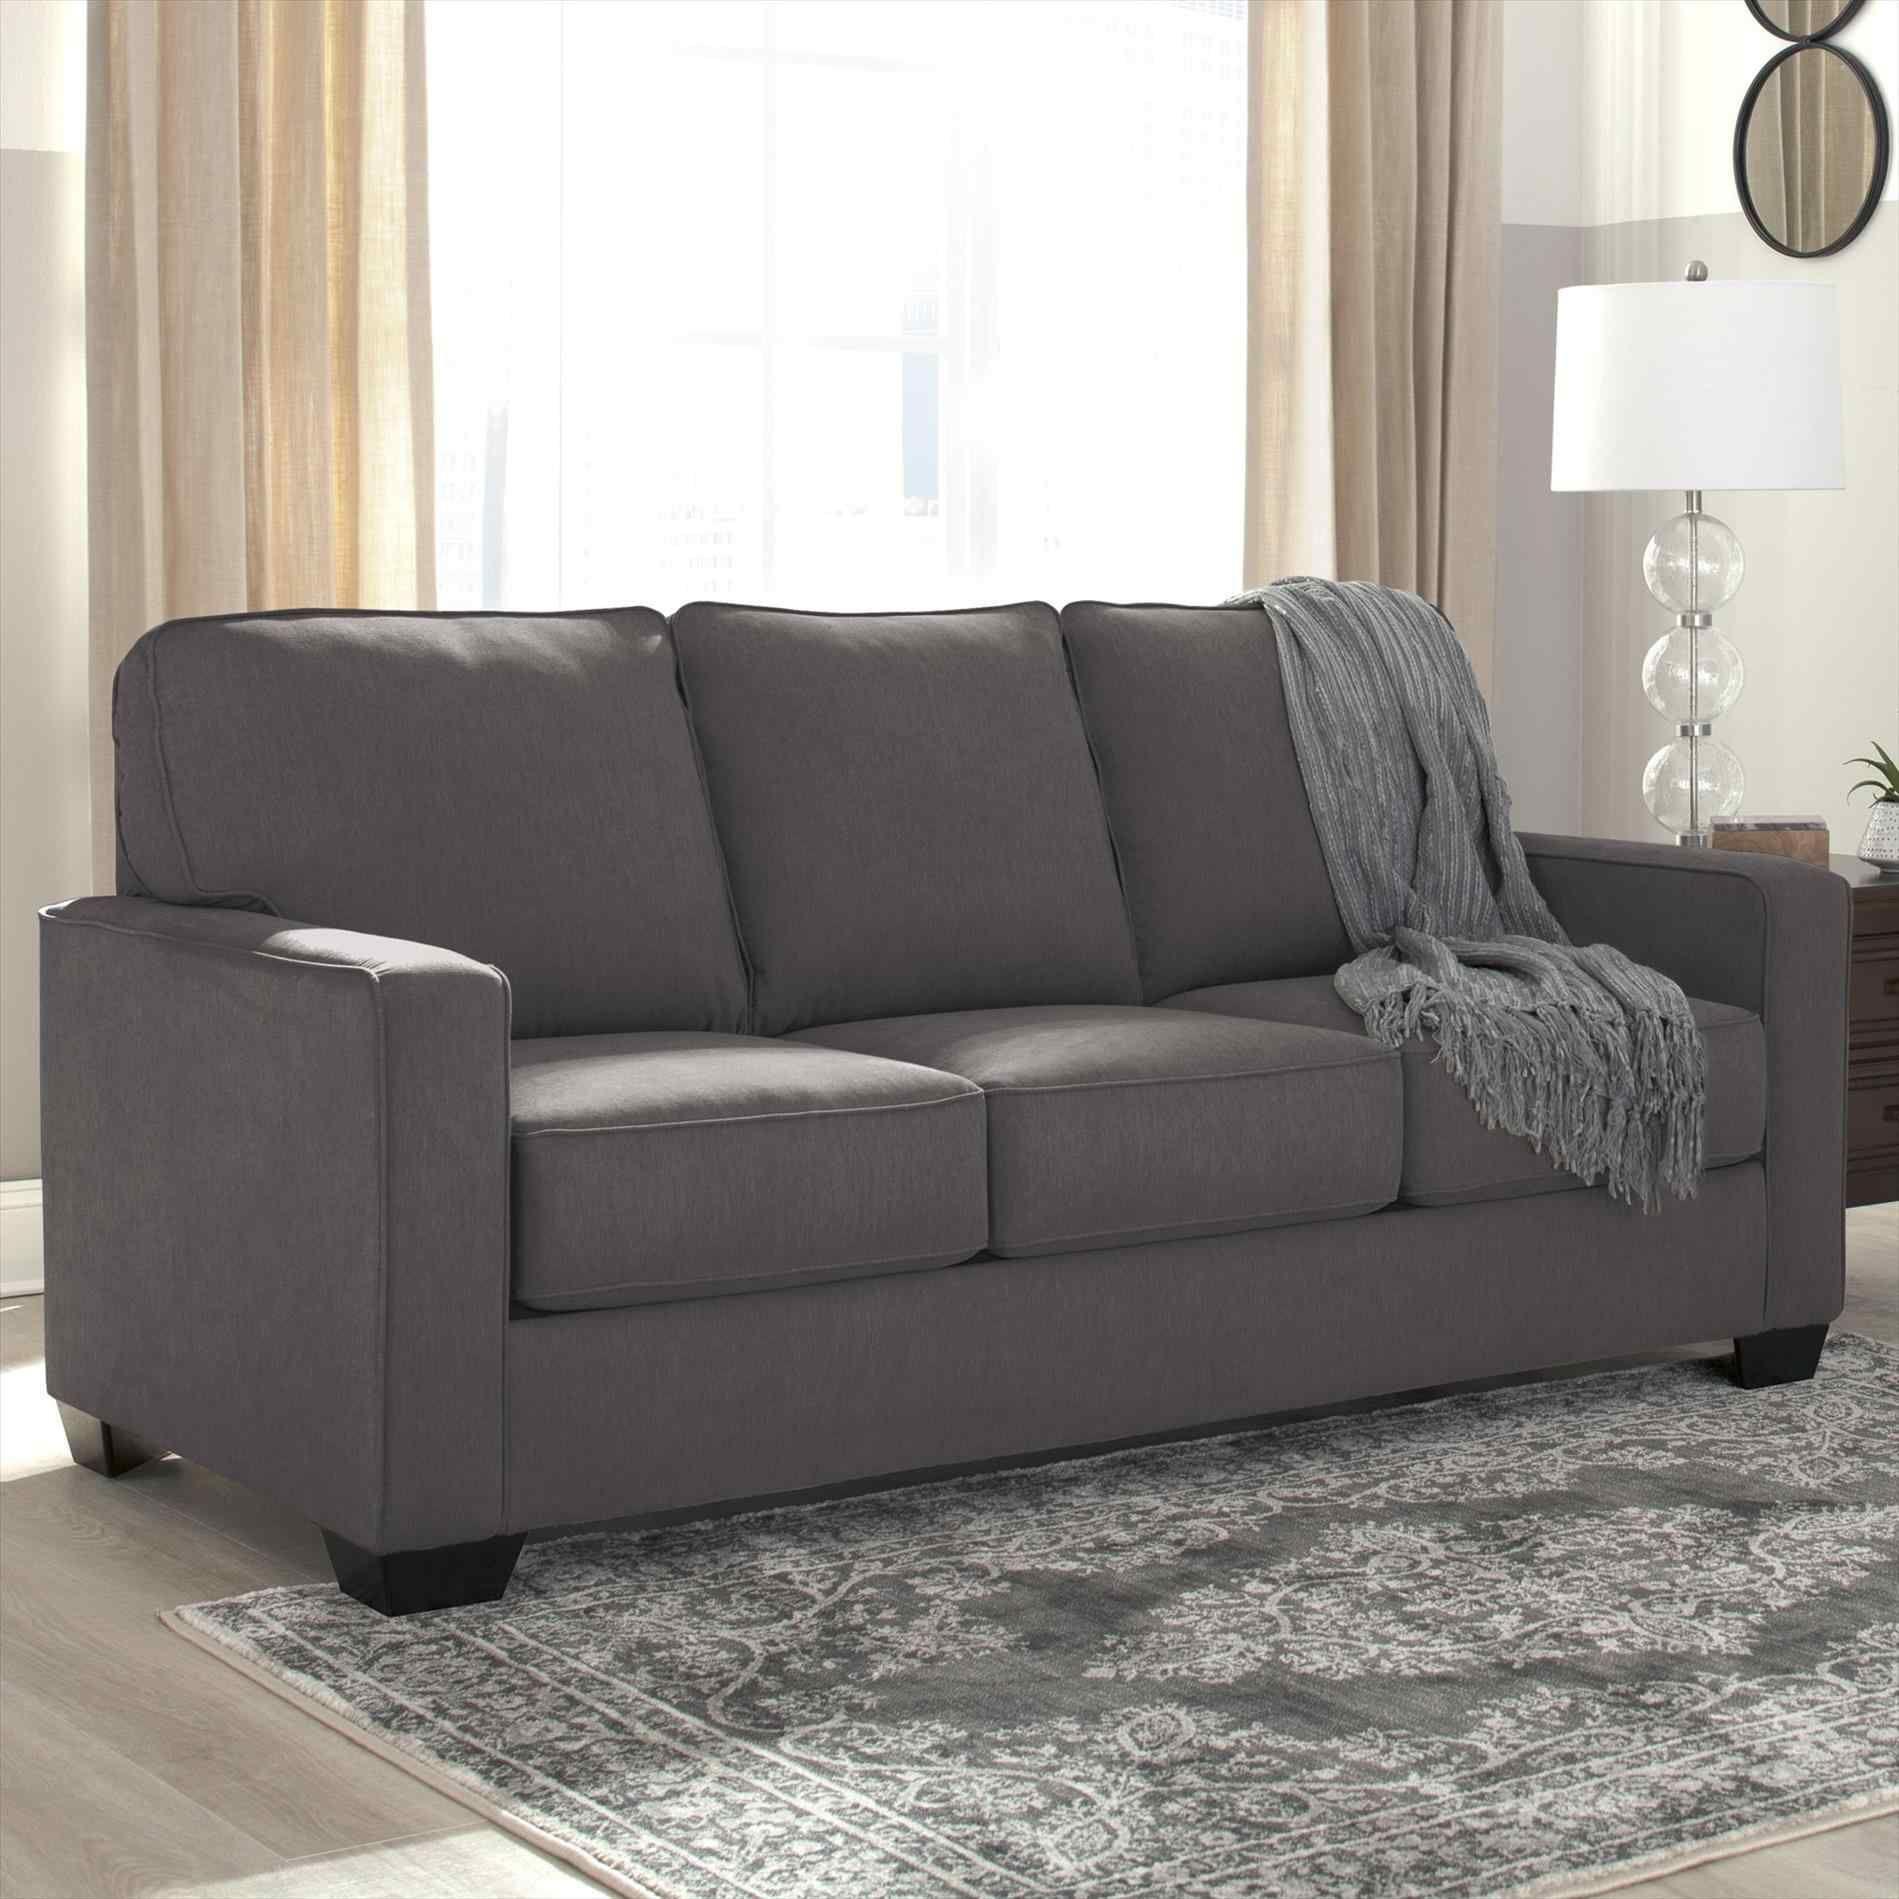 60 inch wide sleeper sofa cream color leather set 991 hayden queen by lacrosse